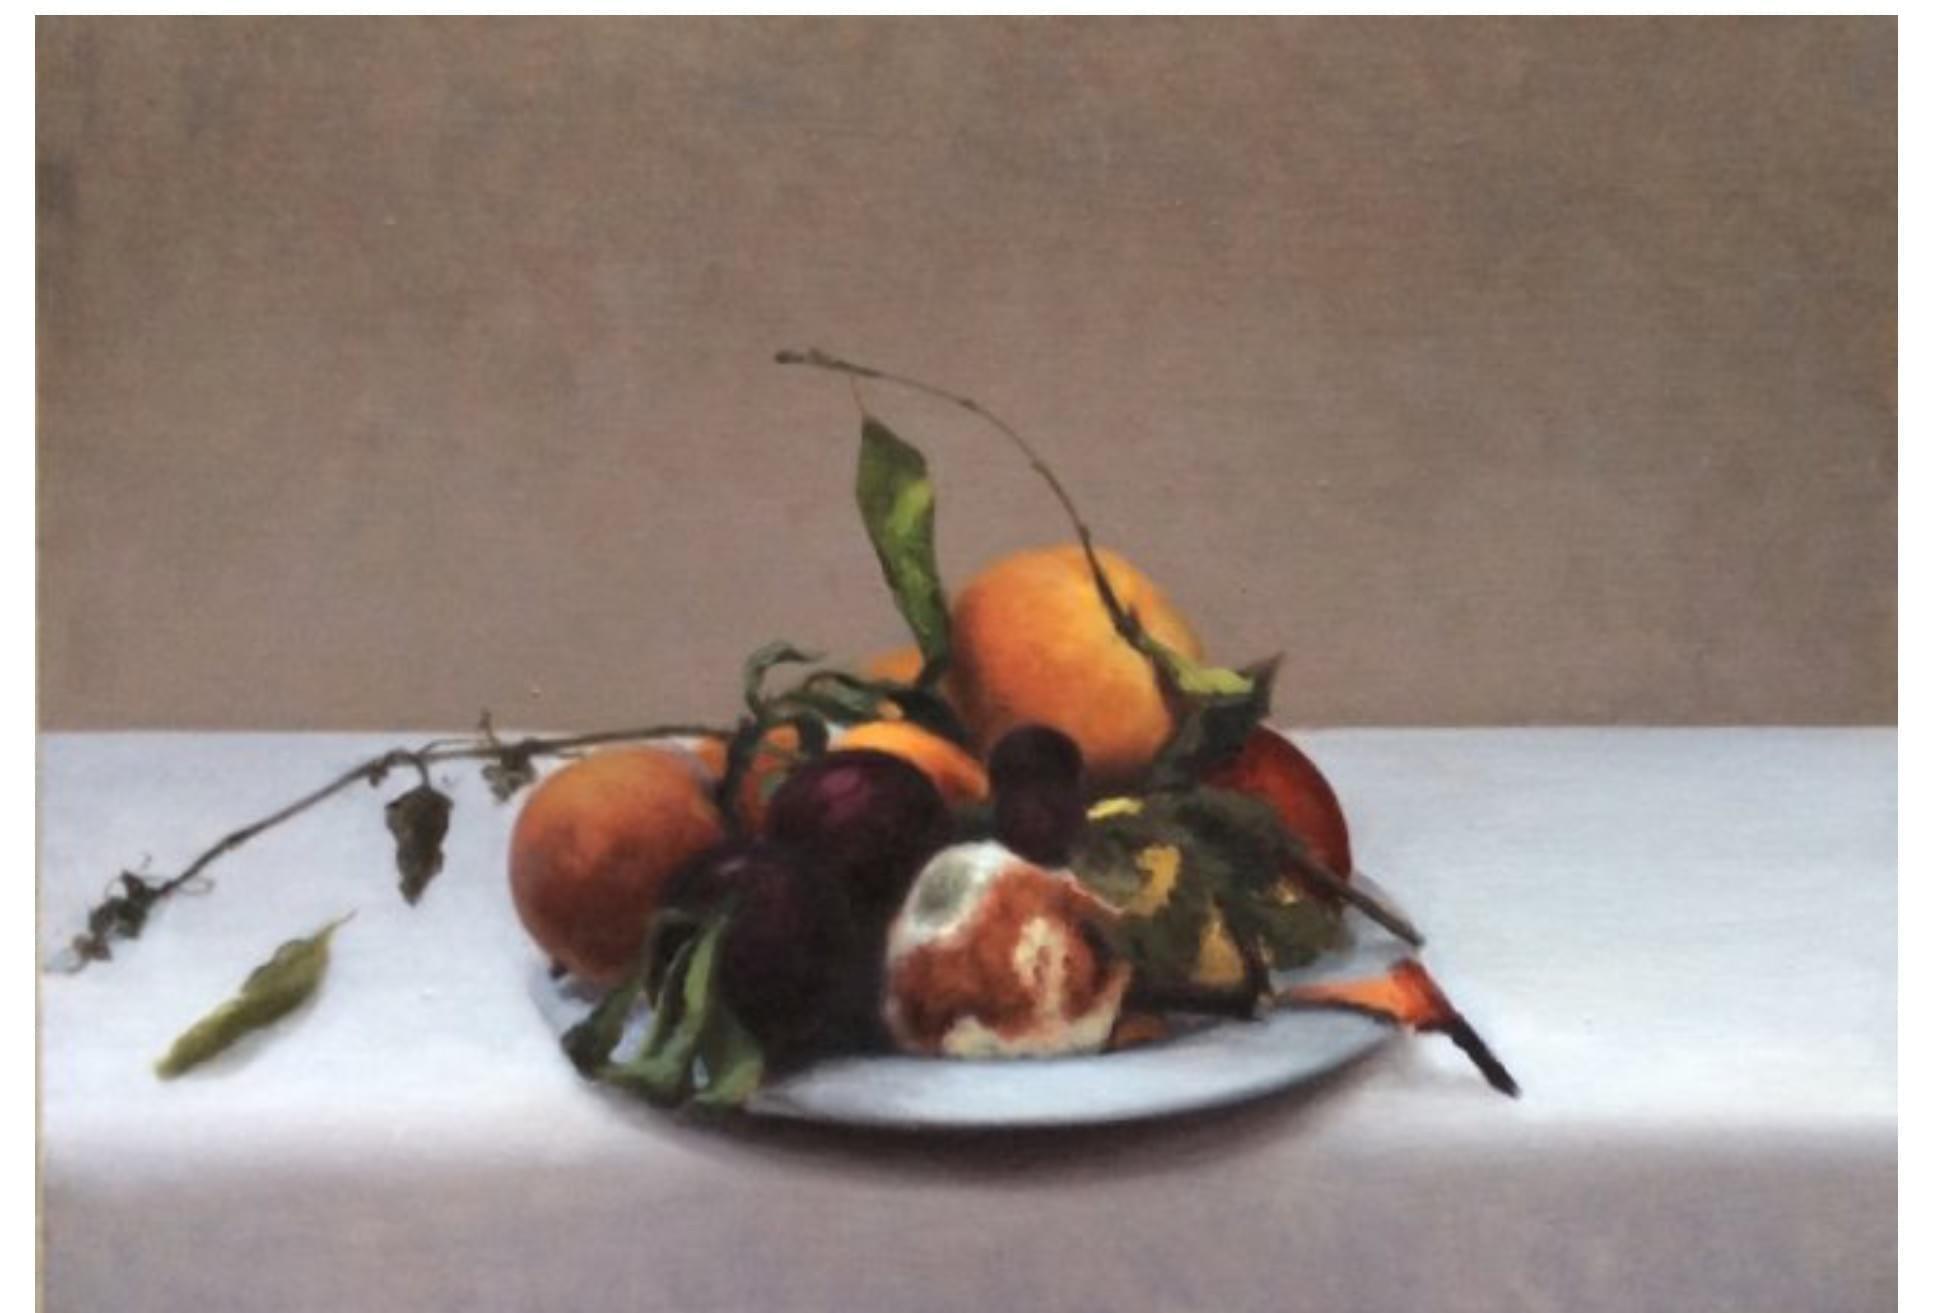 SC454 El Tiempo sobre la mesa E Óleo sobre lienzo 46 x 65 cm. 2015